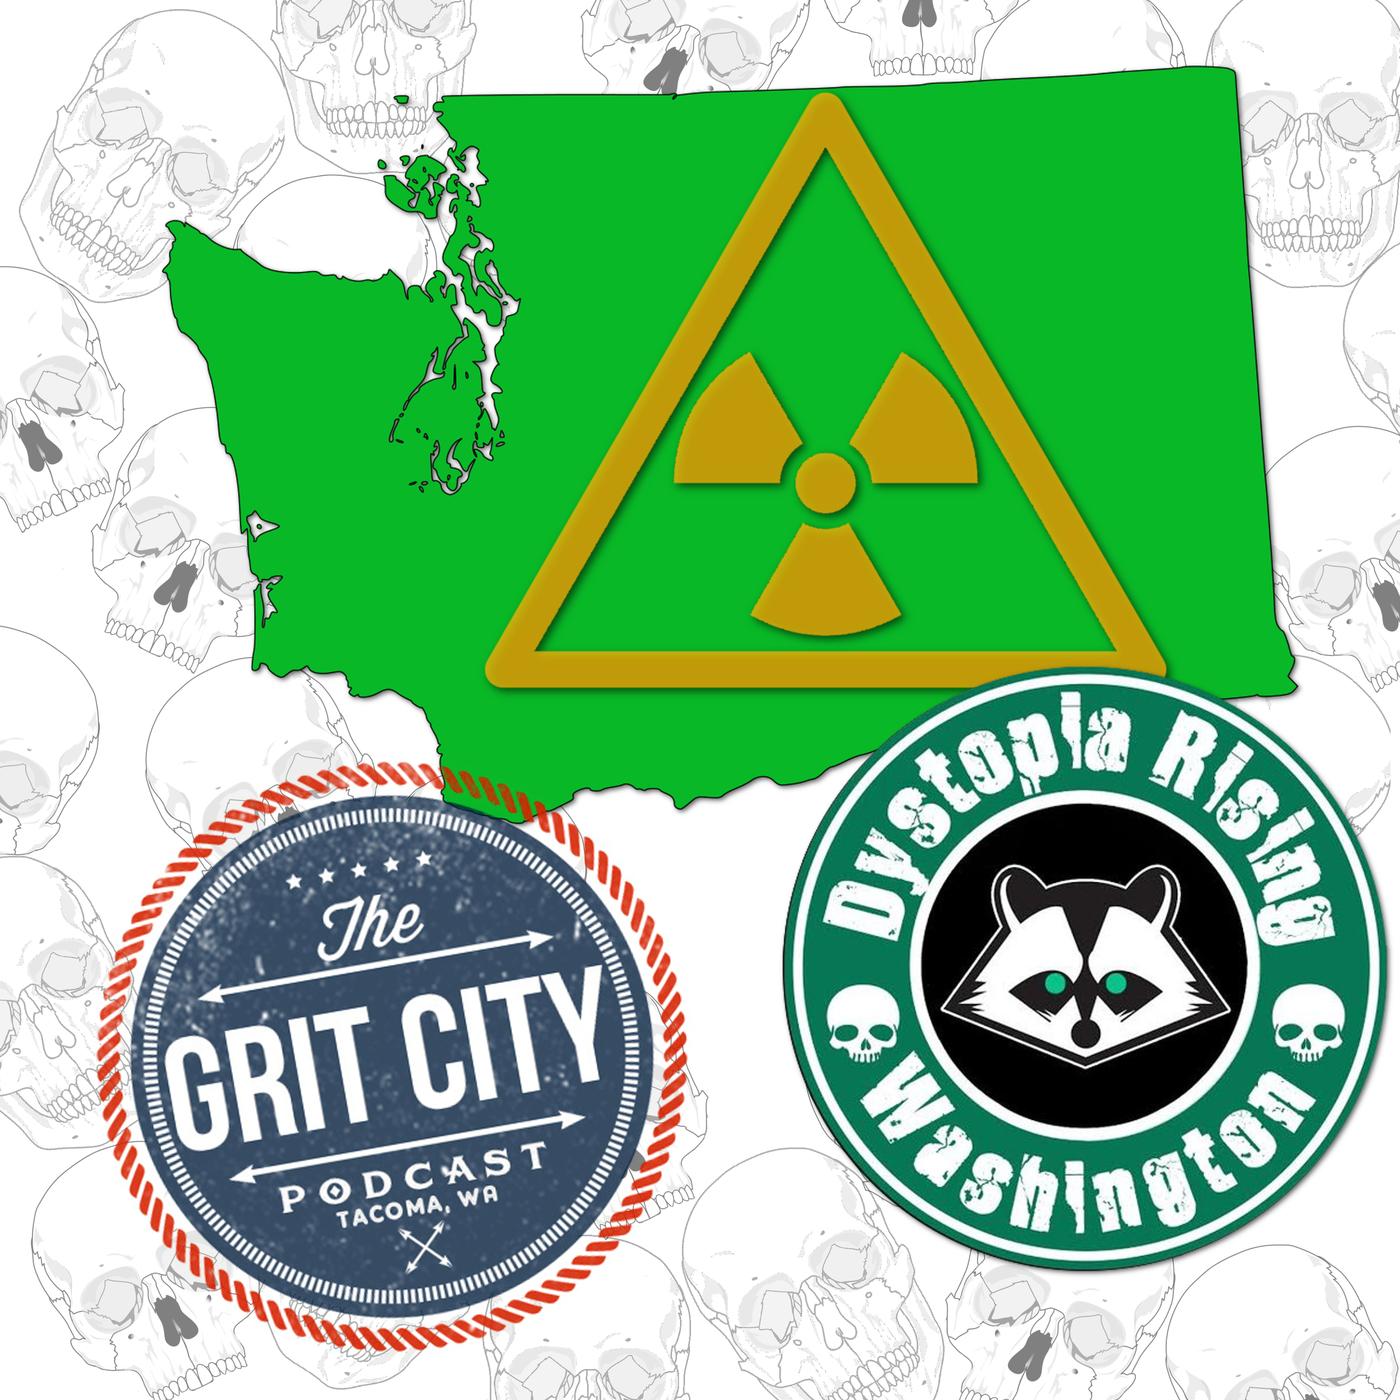 The Grit City Podcast: Dystopia Rising: Washington